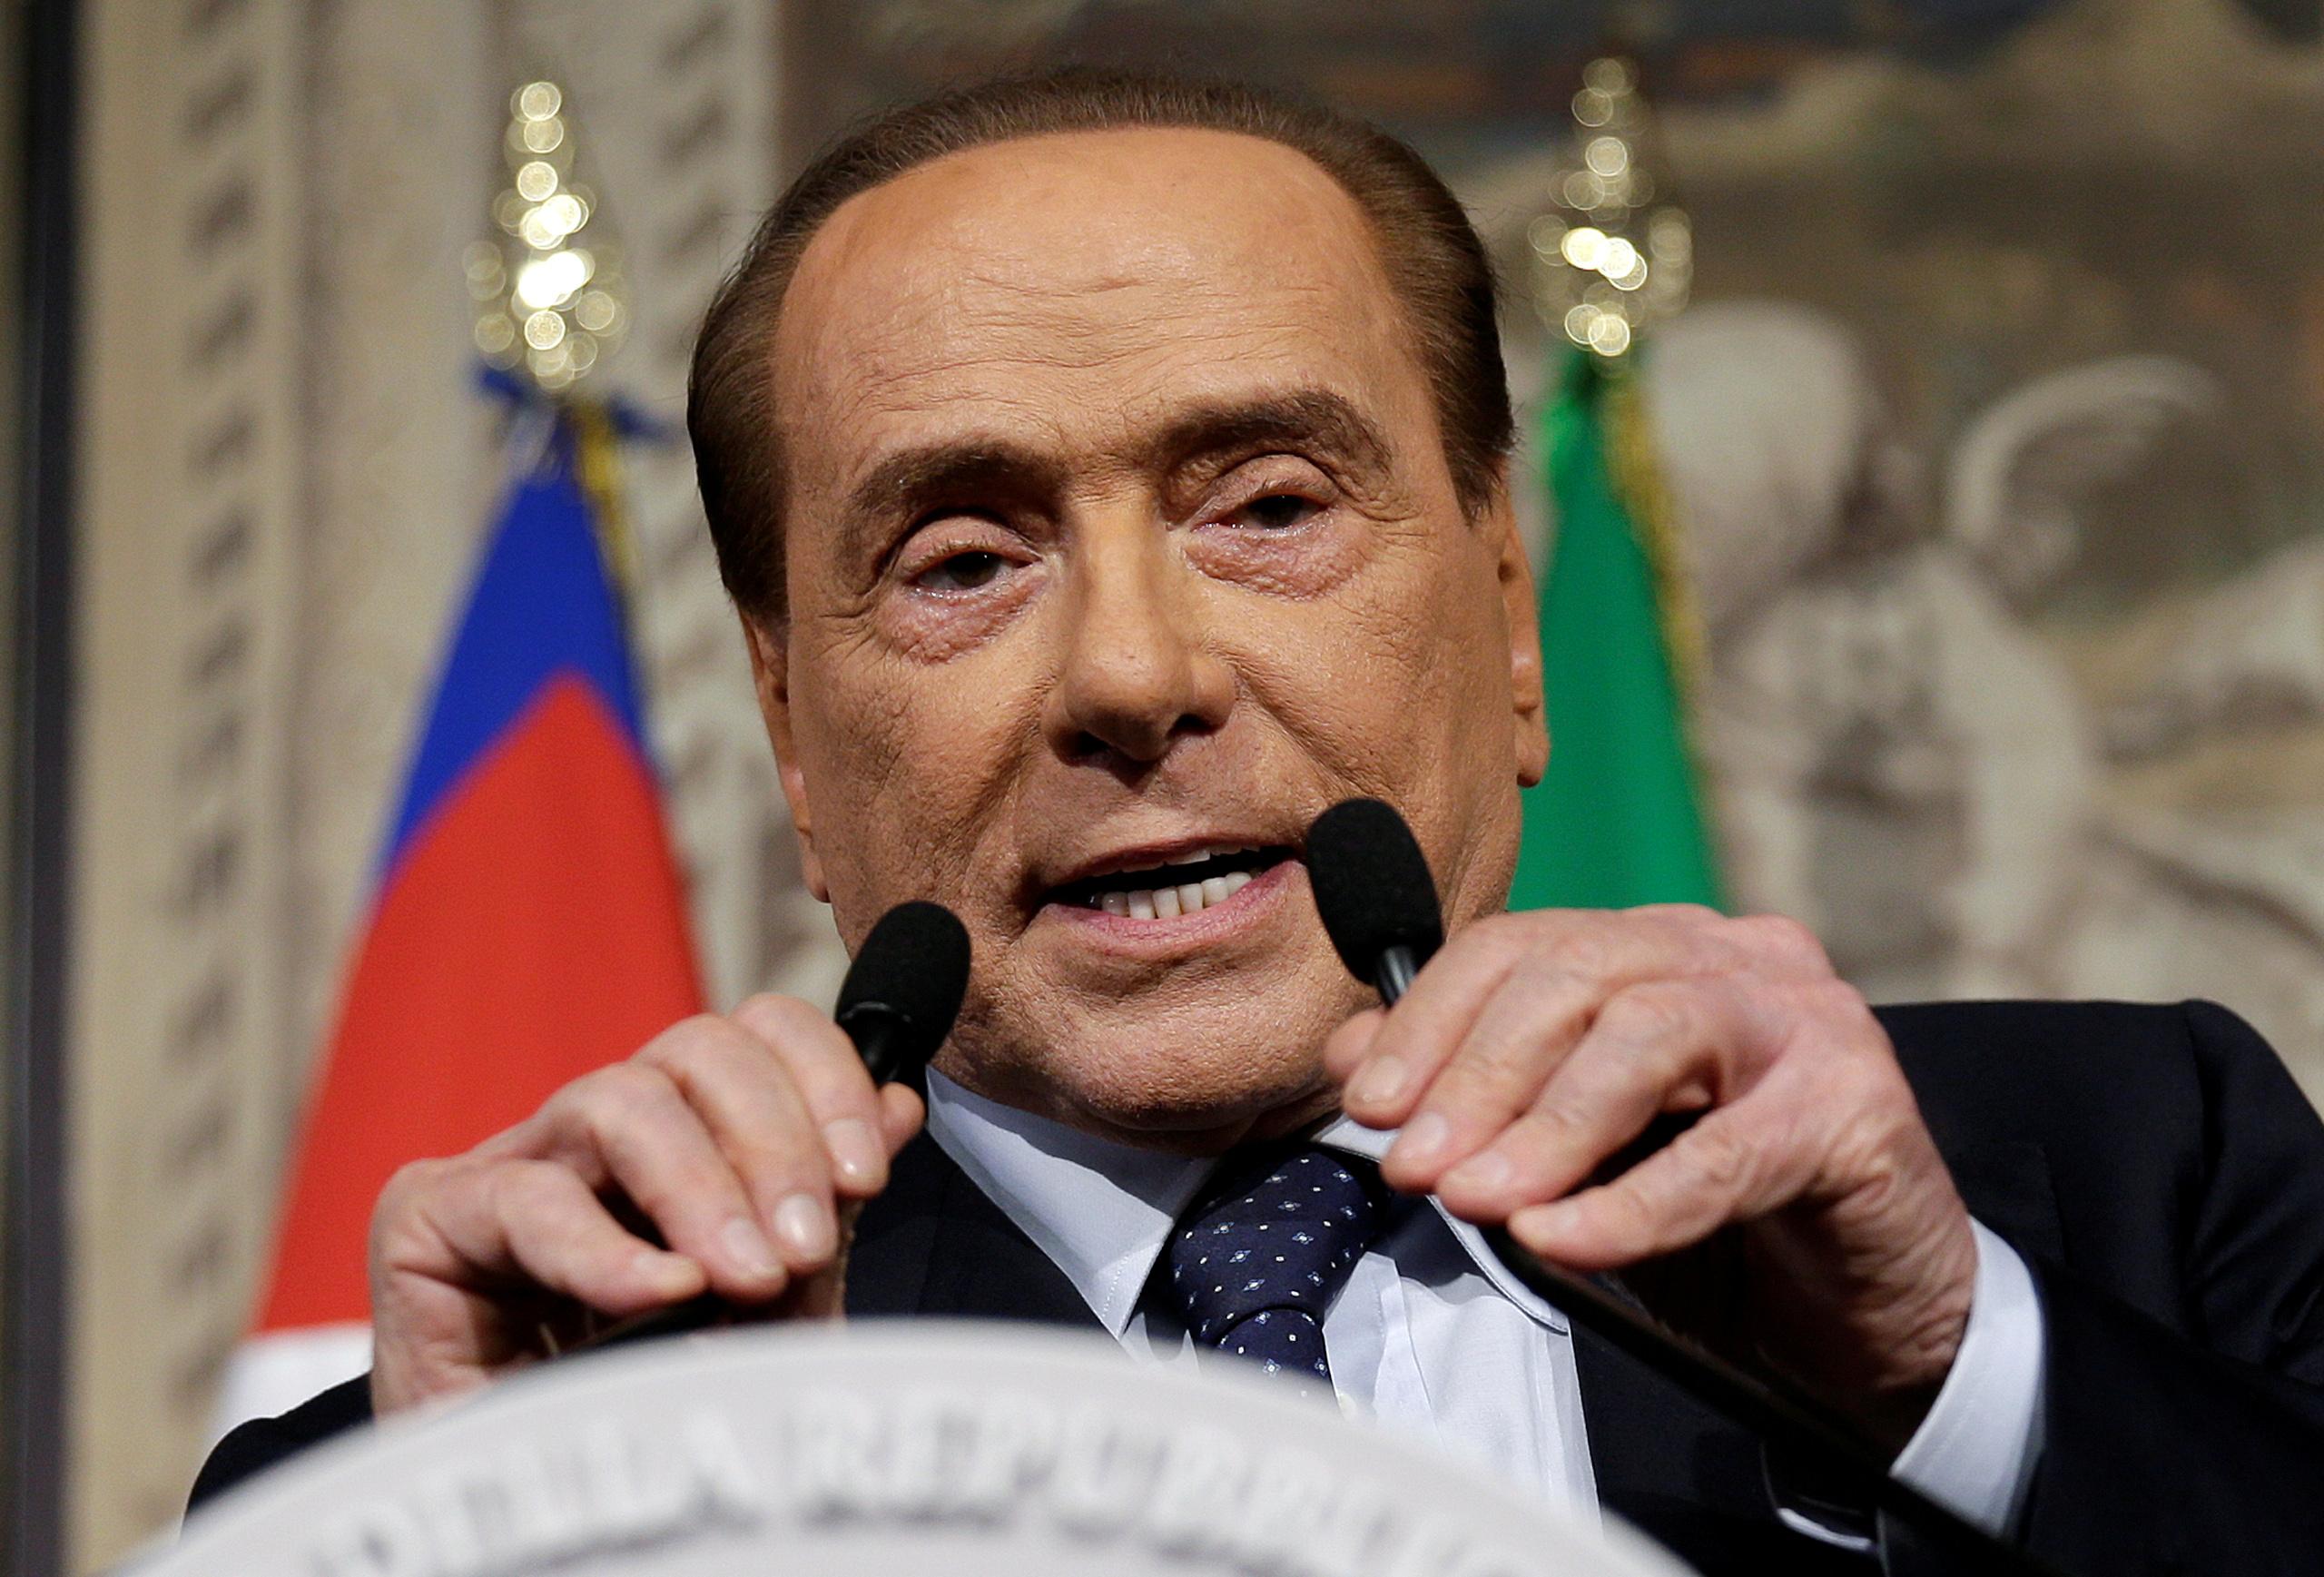 Berlusconi's health condition improves – Newsbook